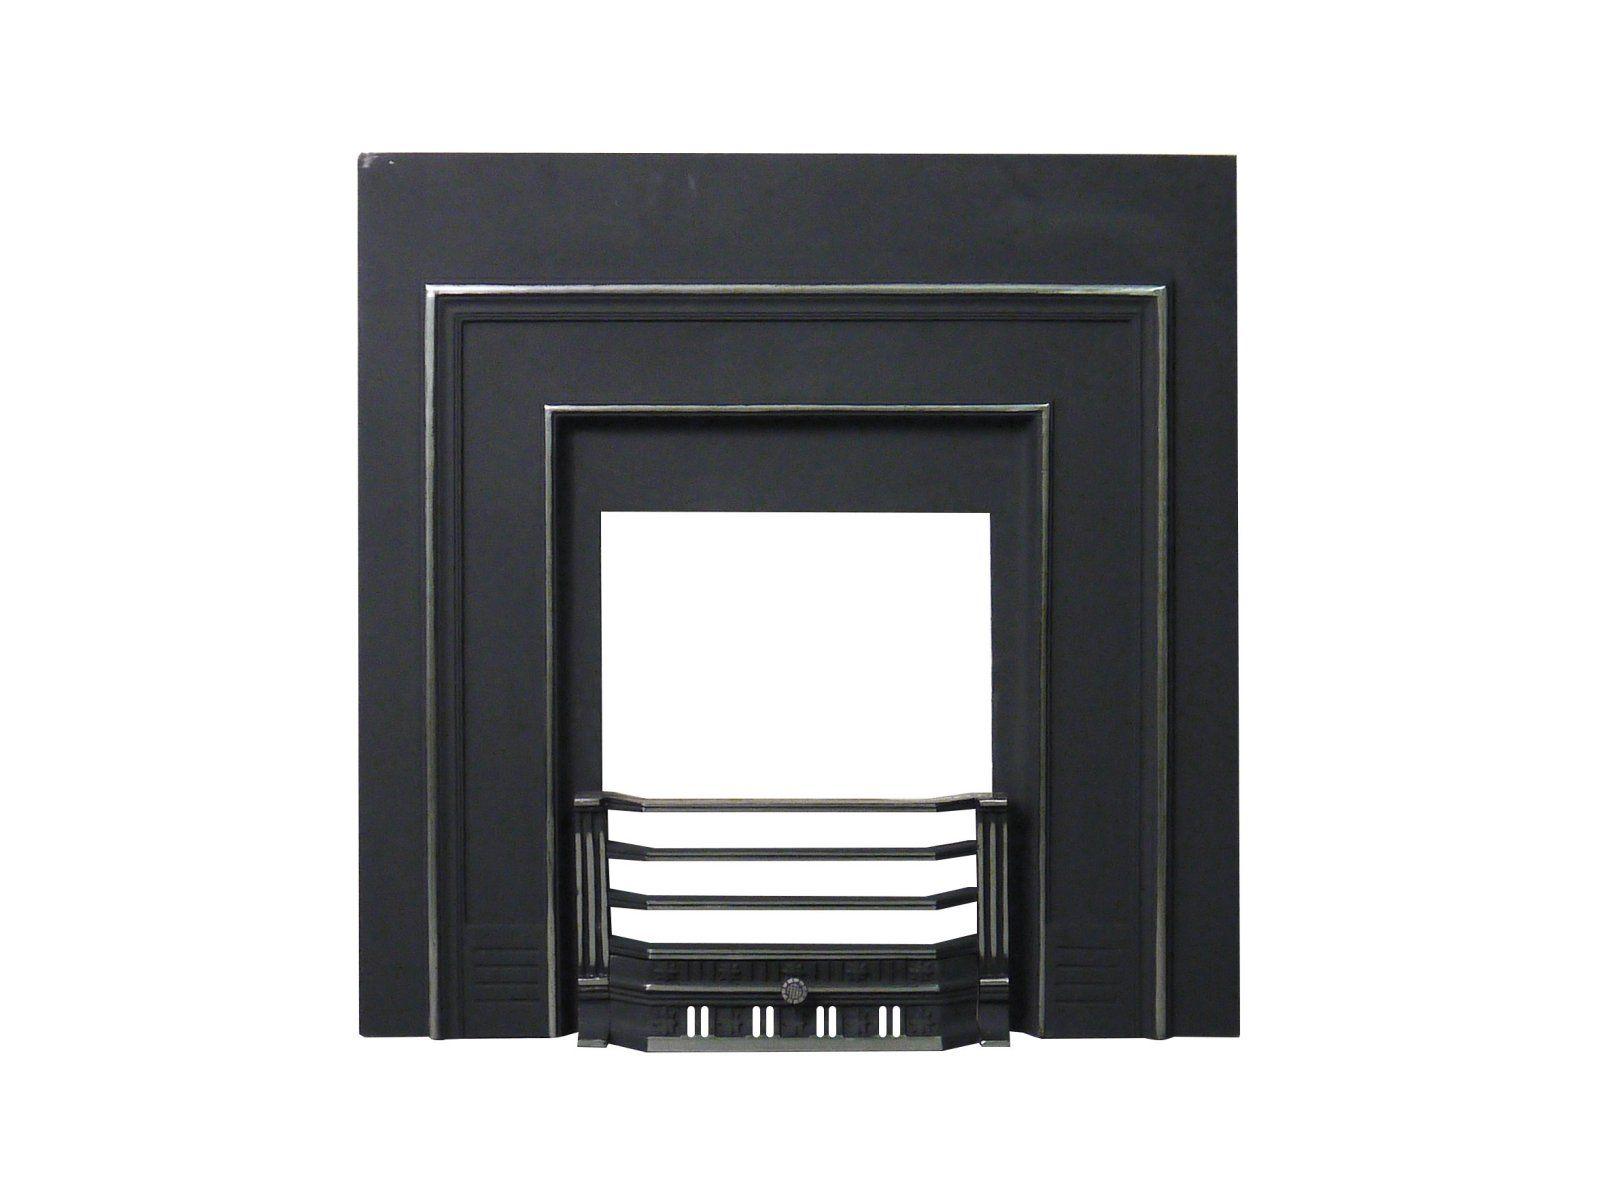 Britannic Cast Iron Fireplace Back Panel Set, 38 Inch | Fireplace ...